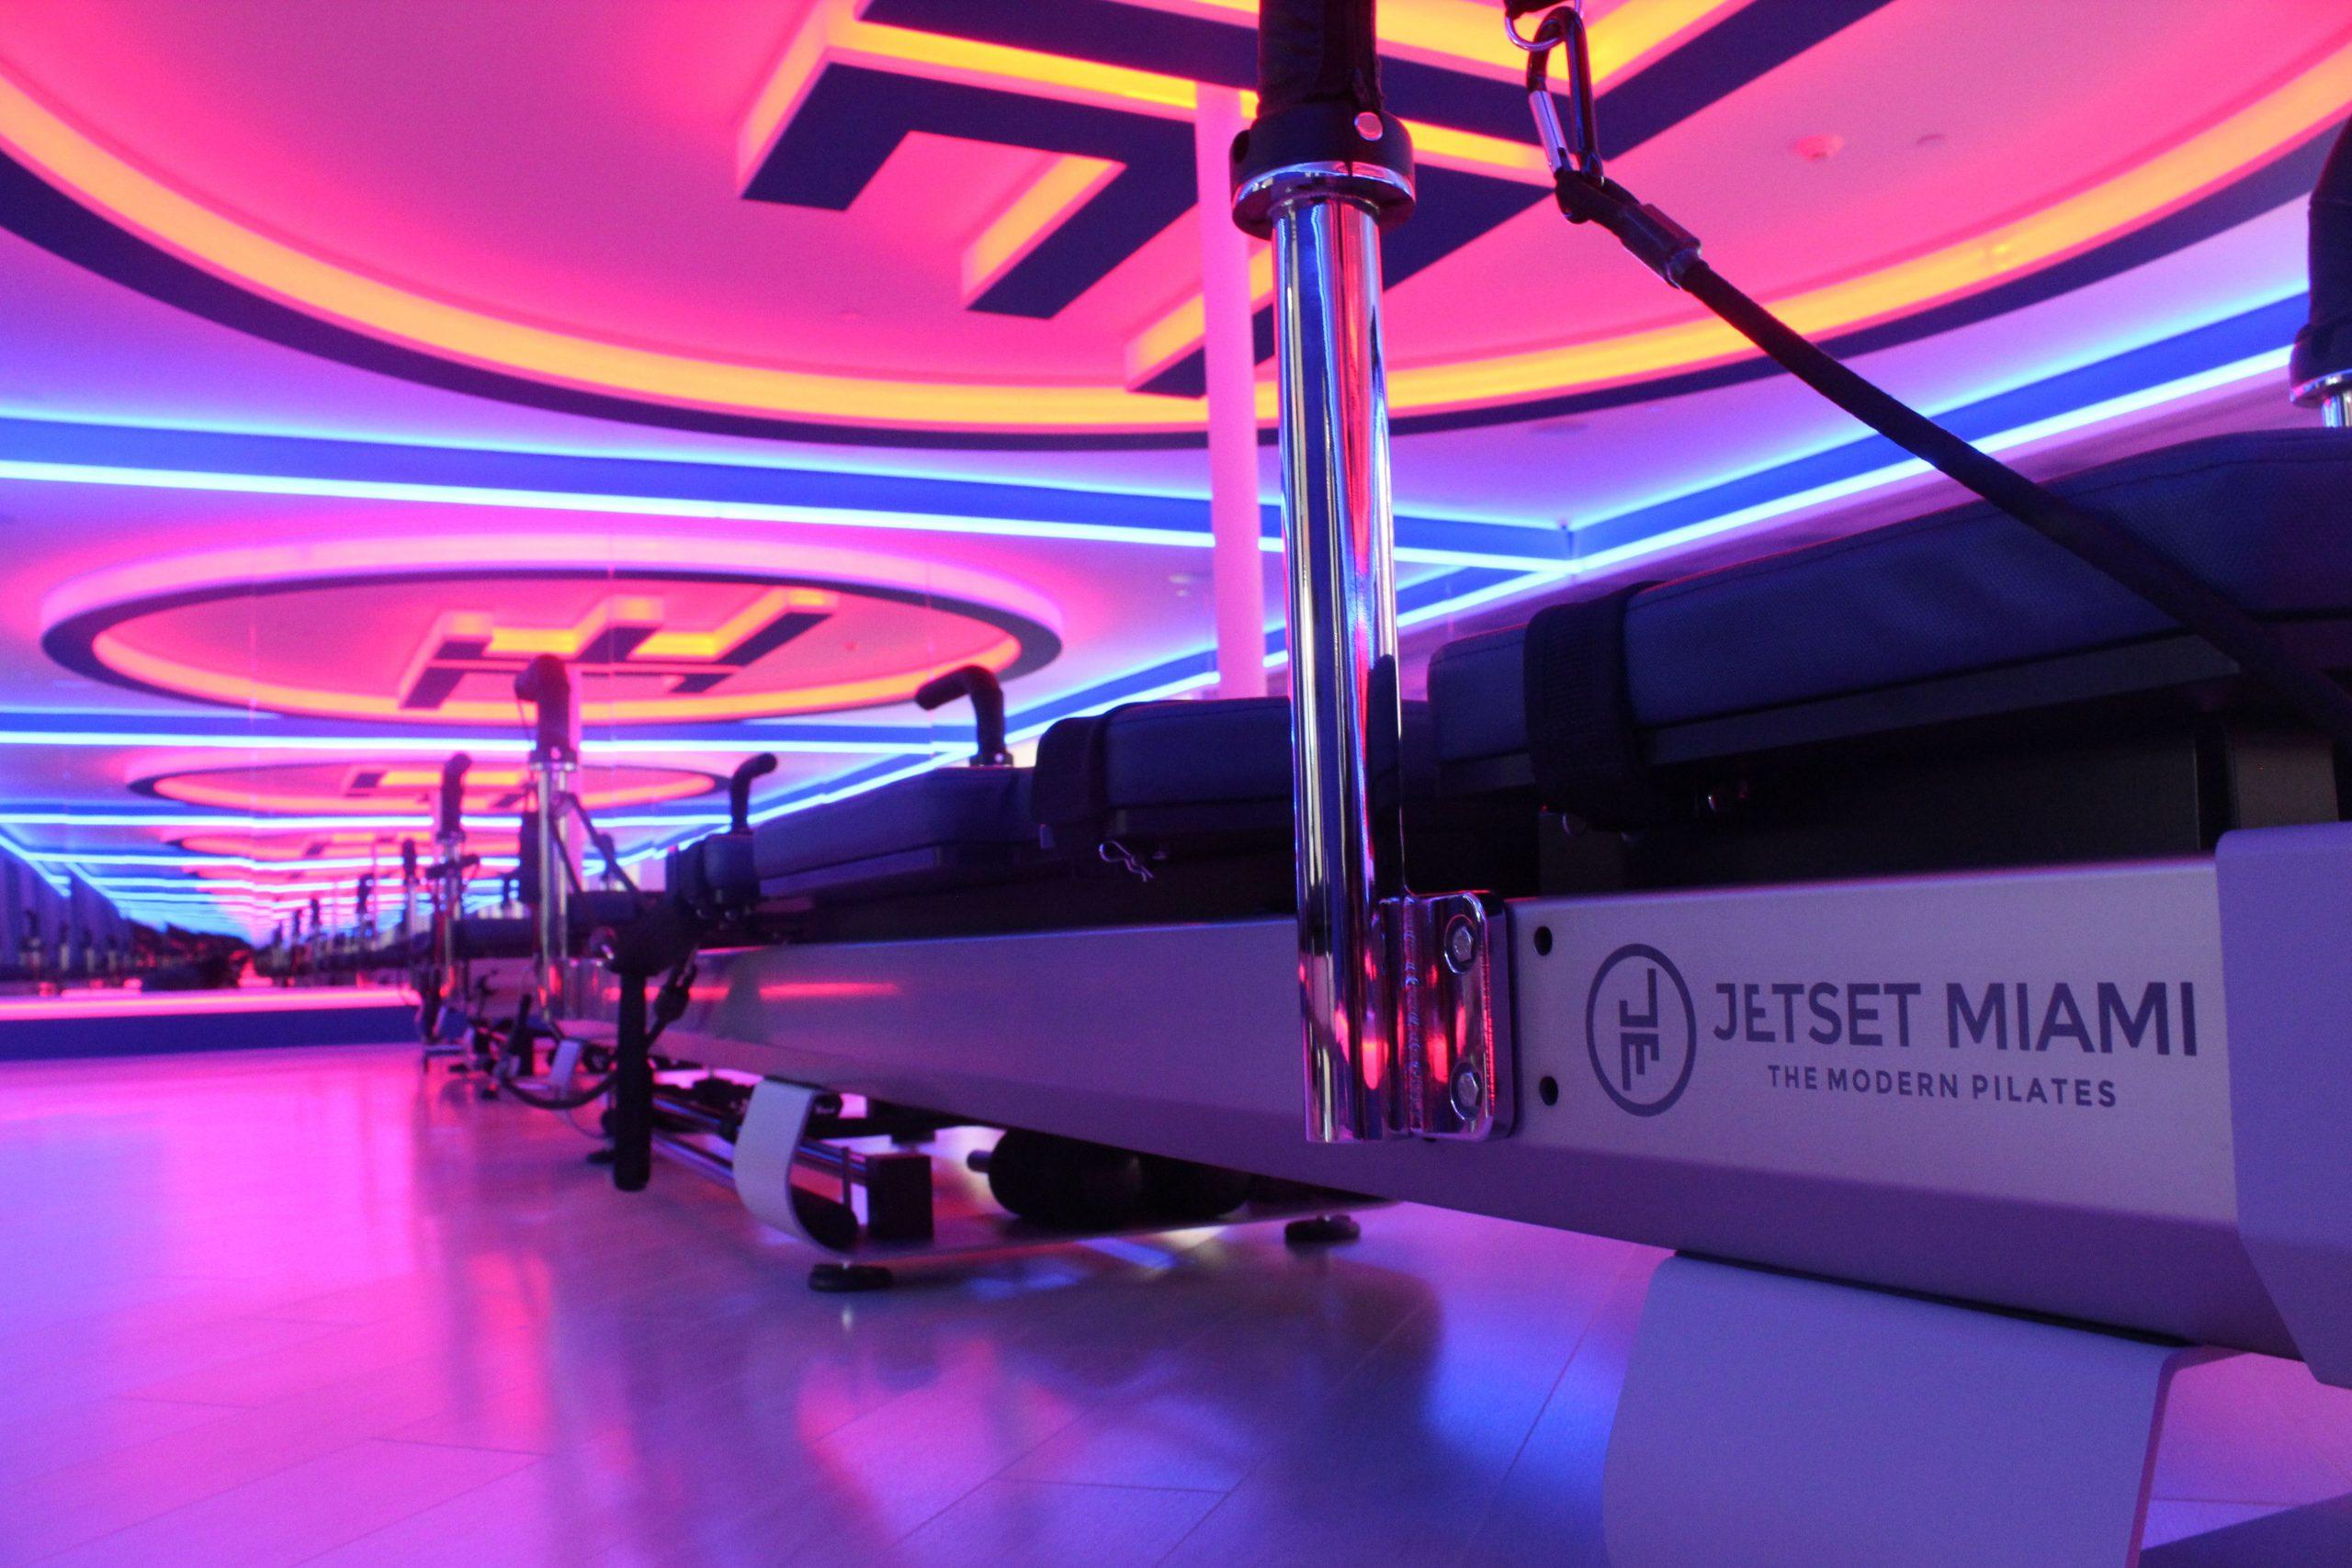 JETSET Miami Pilates|JETSET Miami Pilates|JETSET Miami Pilates|JETSET Miami Pilates|JETSET Miami Pilates